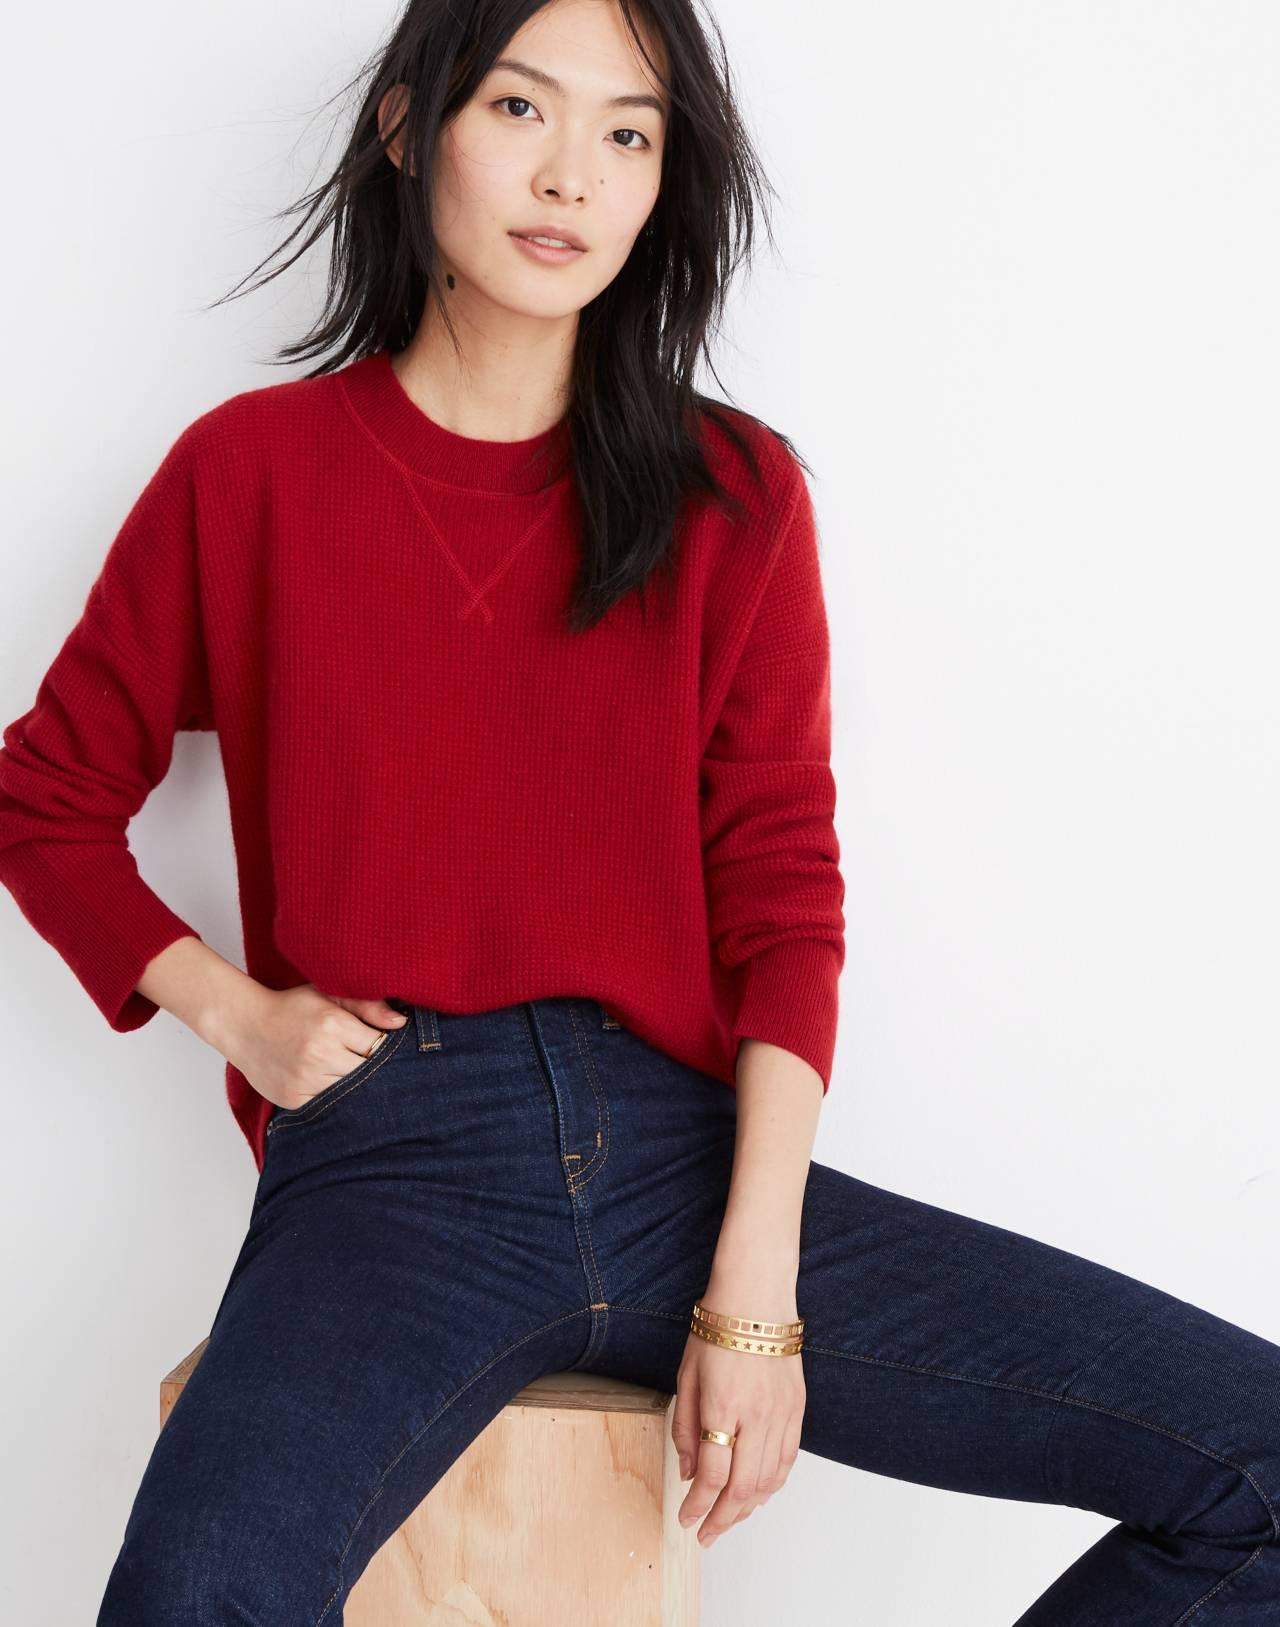 Cashmere Sweatshirt in crimson red image 1